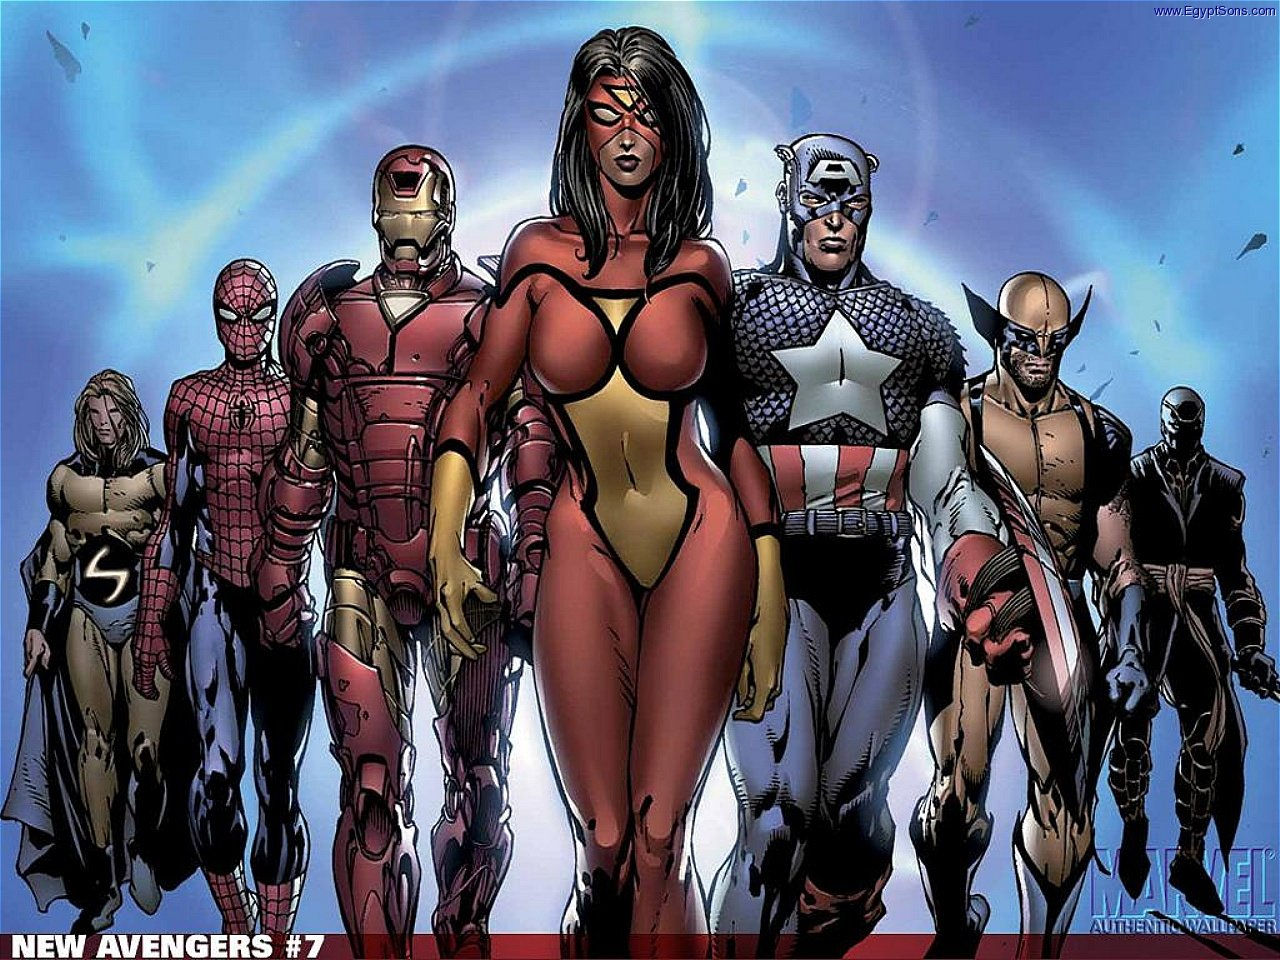 http://beyondthebunker.files.wordpress.com/2011/12/new-avengers-1.jpg